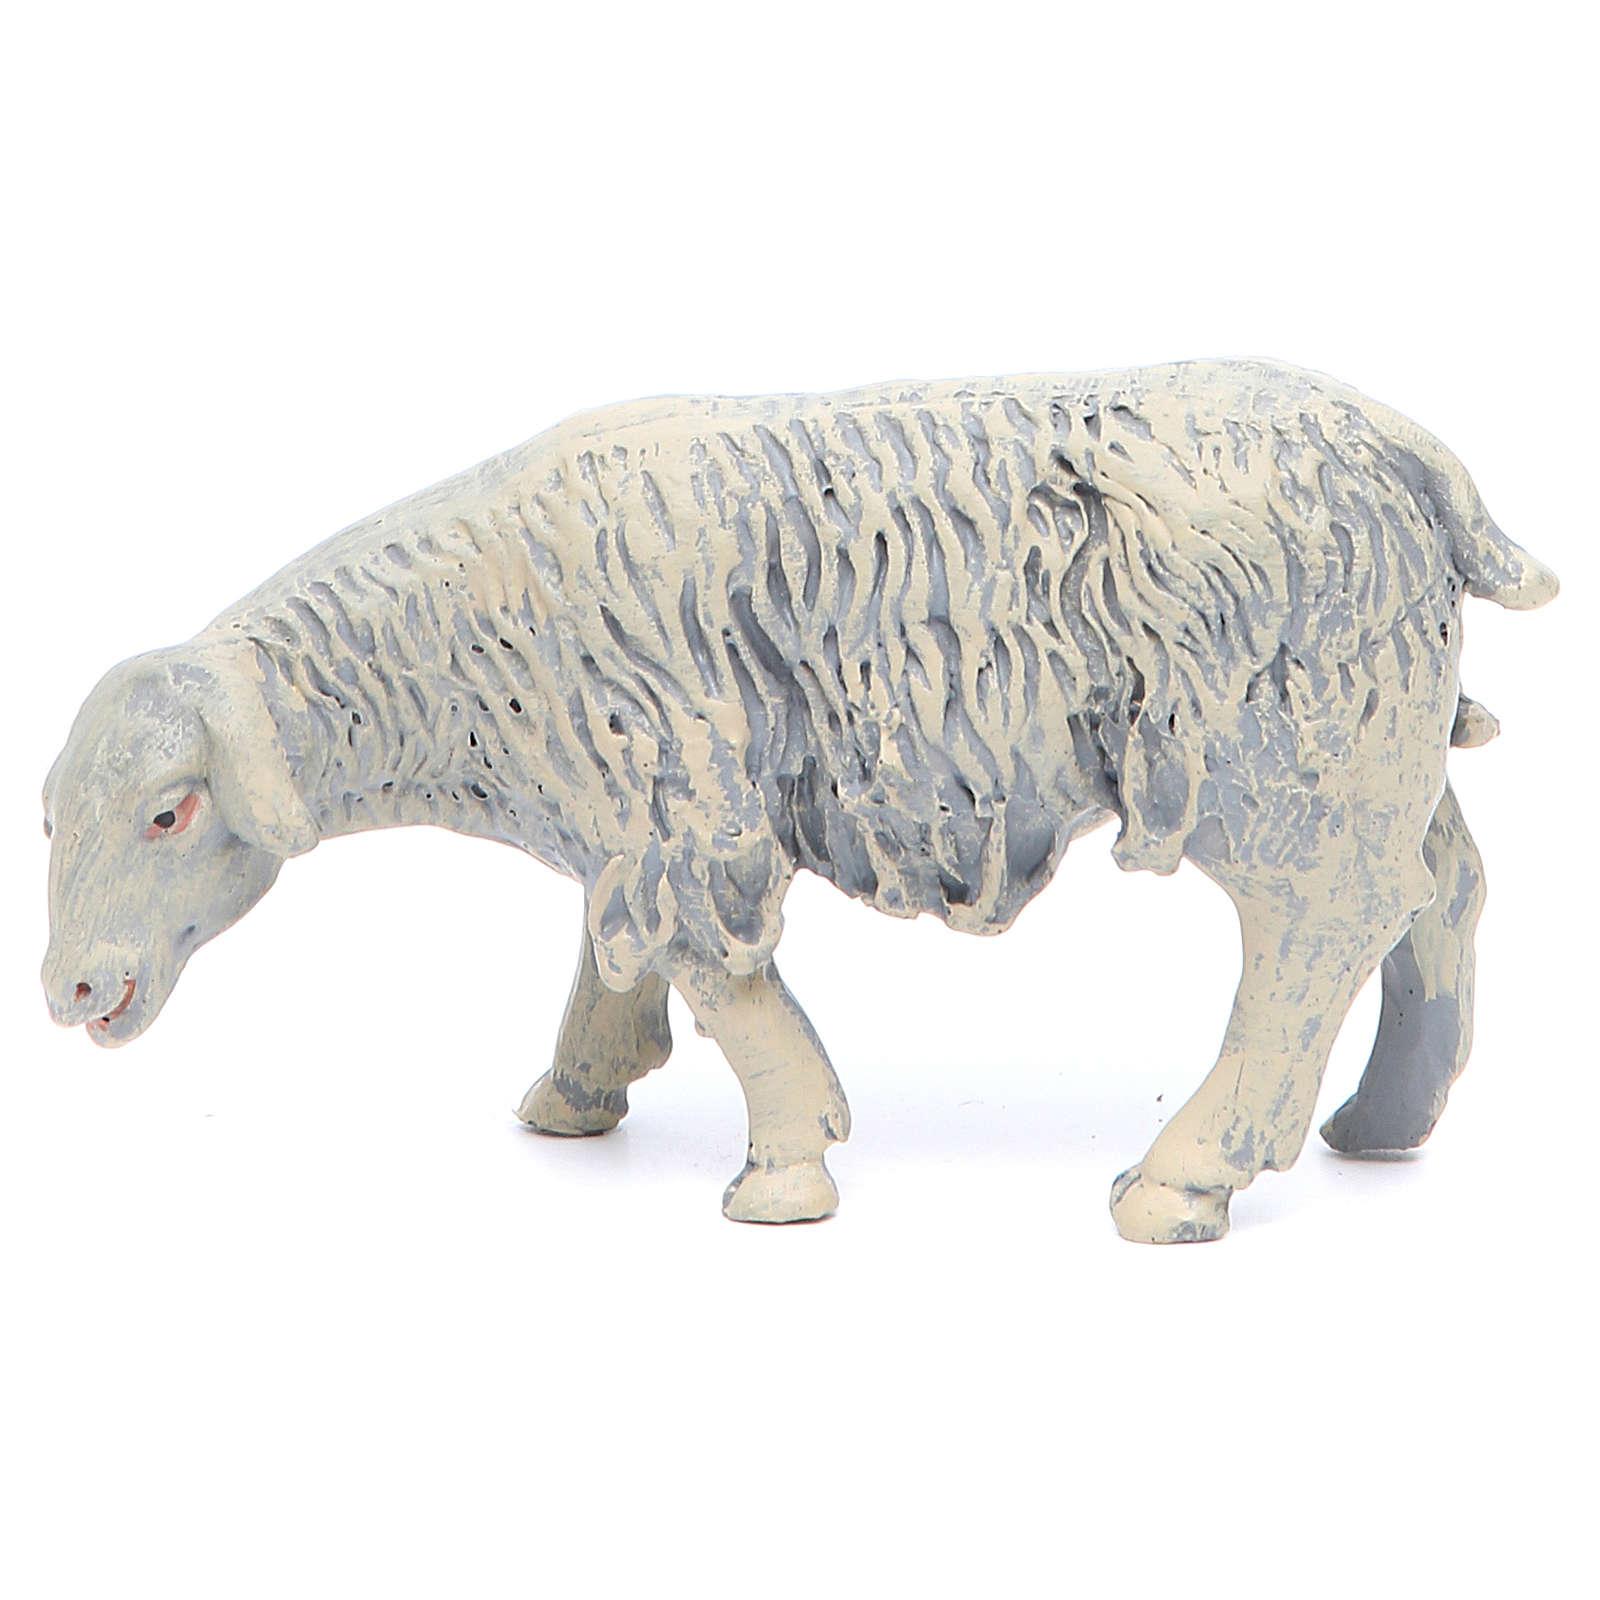 Pecore in resina per presepe da 25 cm 4 pezzi 3